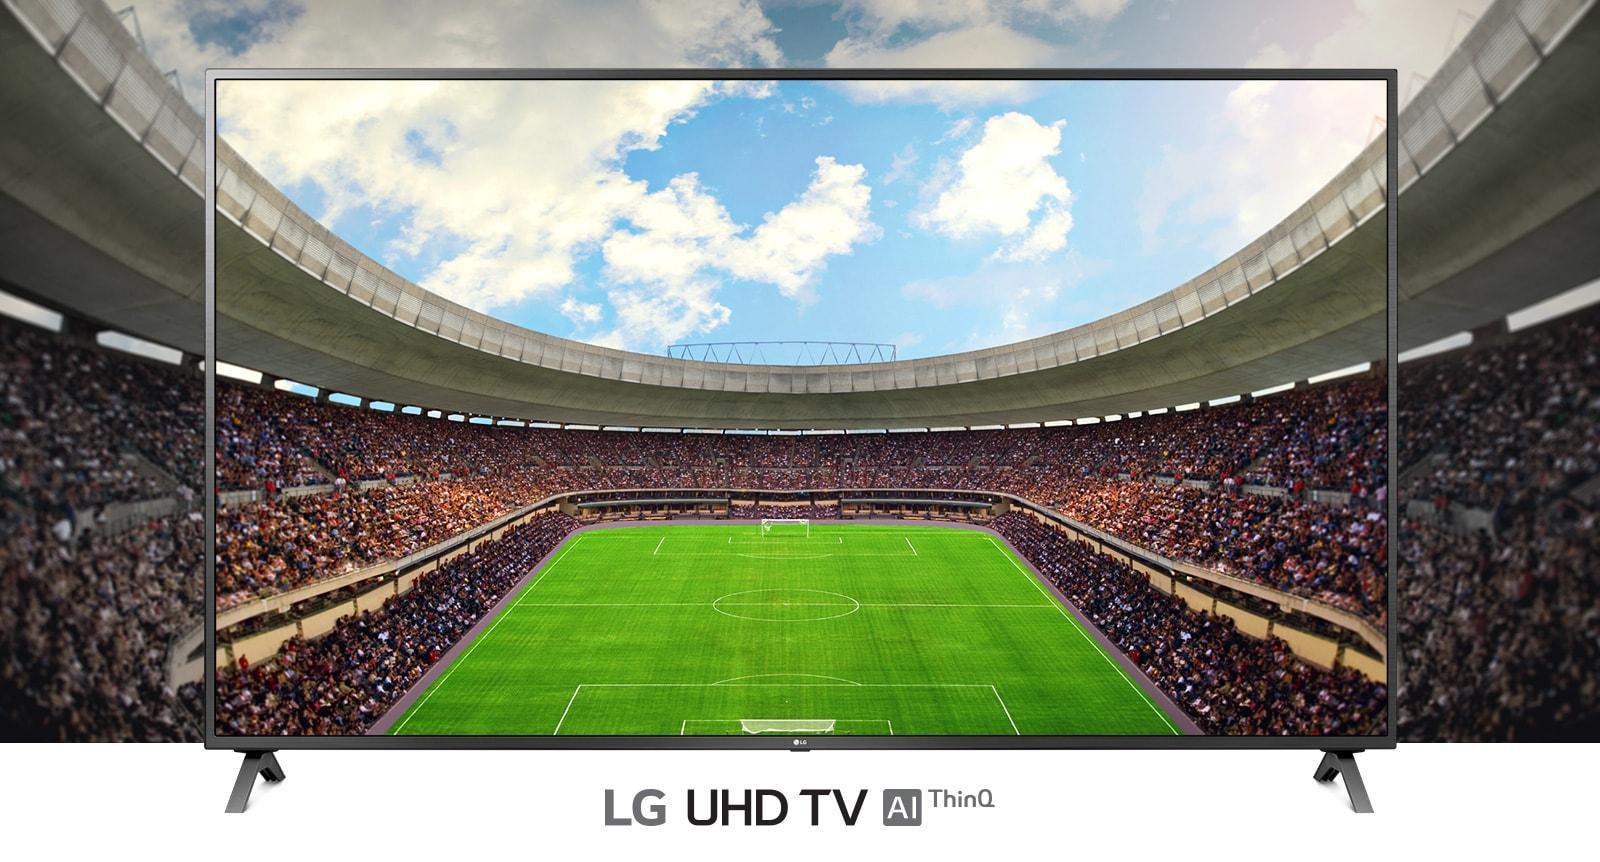 https://www.lg.com/hu/images/televiziok/md07502471/features/TV-UHD-01-Real-4K-Desktop.jpg